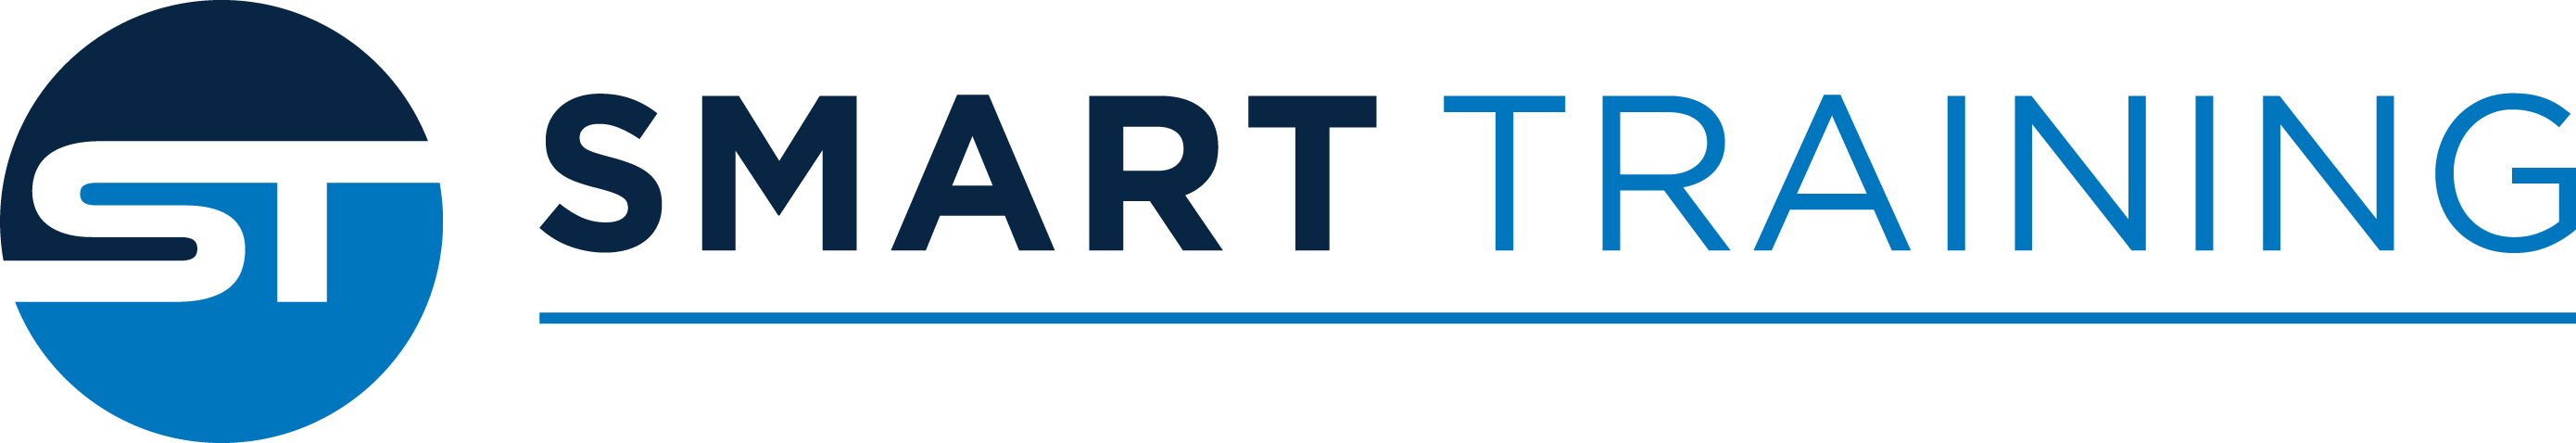 smart training logo